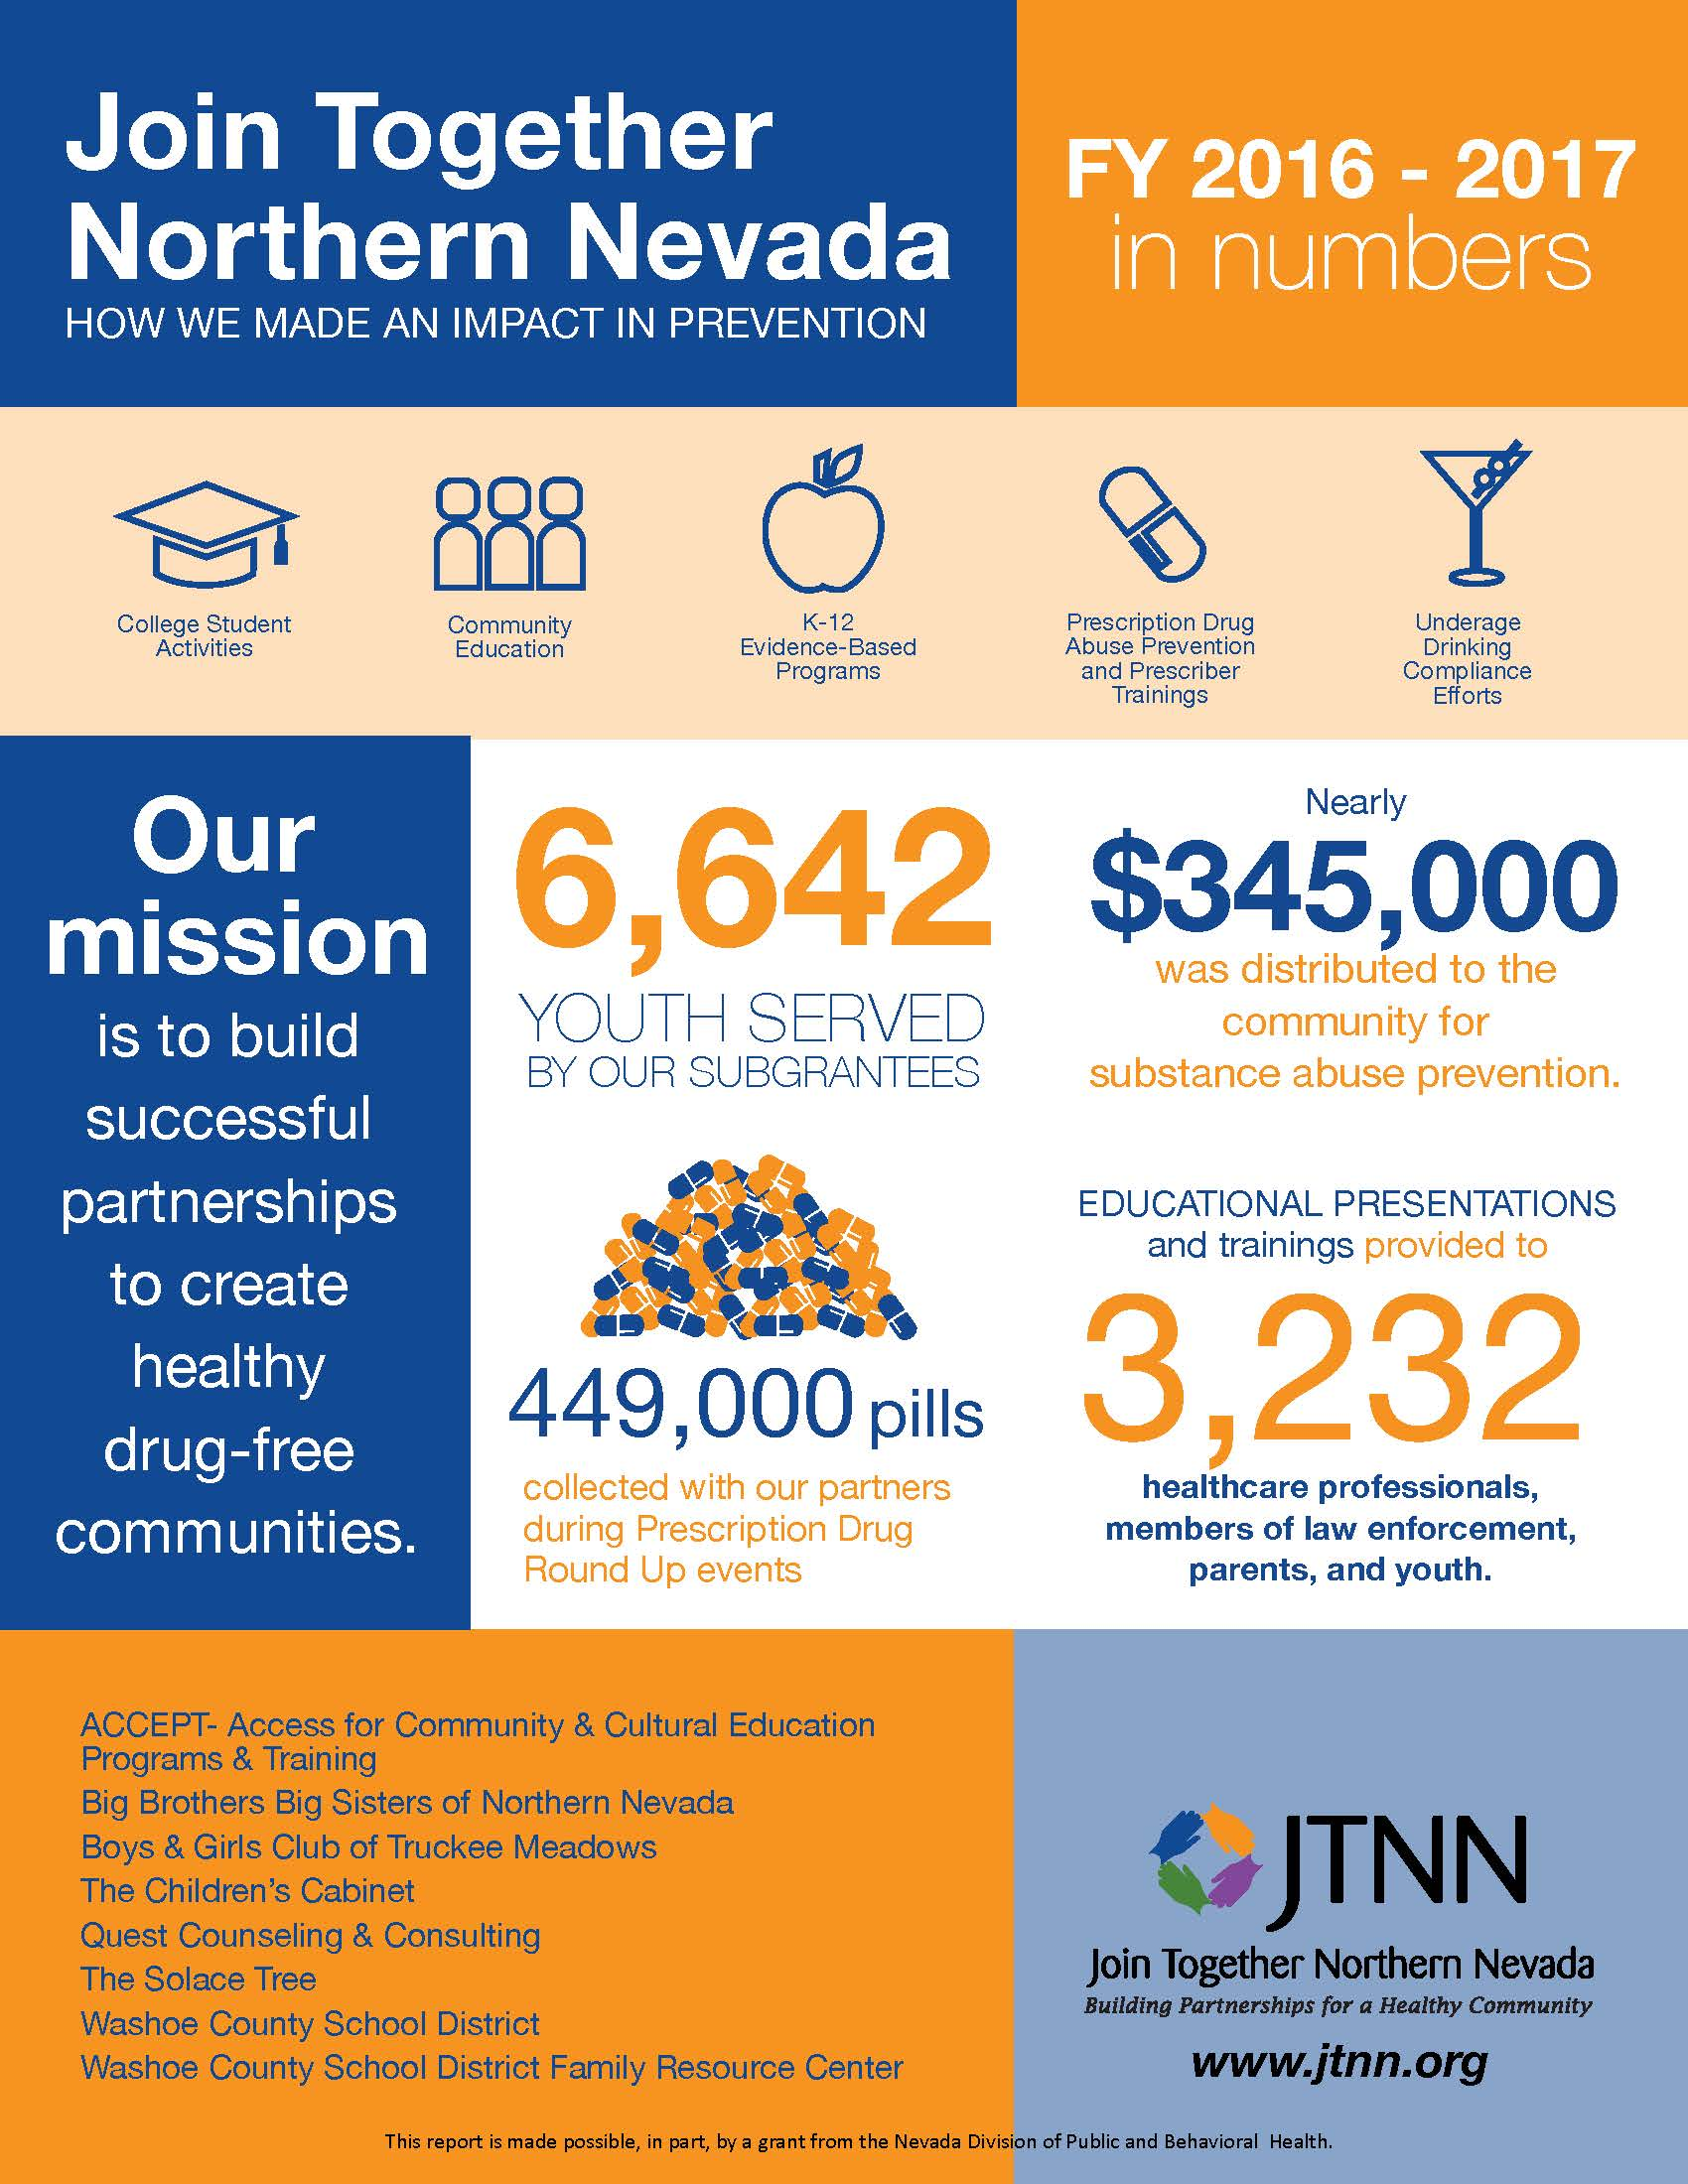 JTNN 16-17 Annual Report Infographic